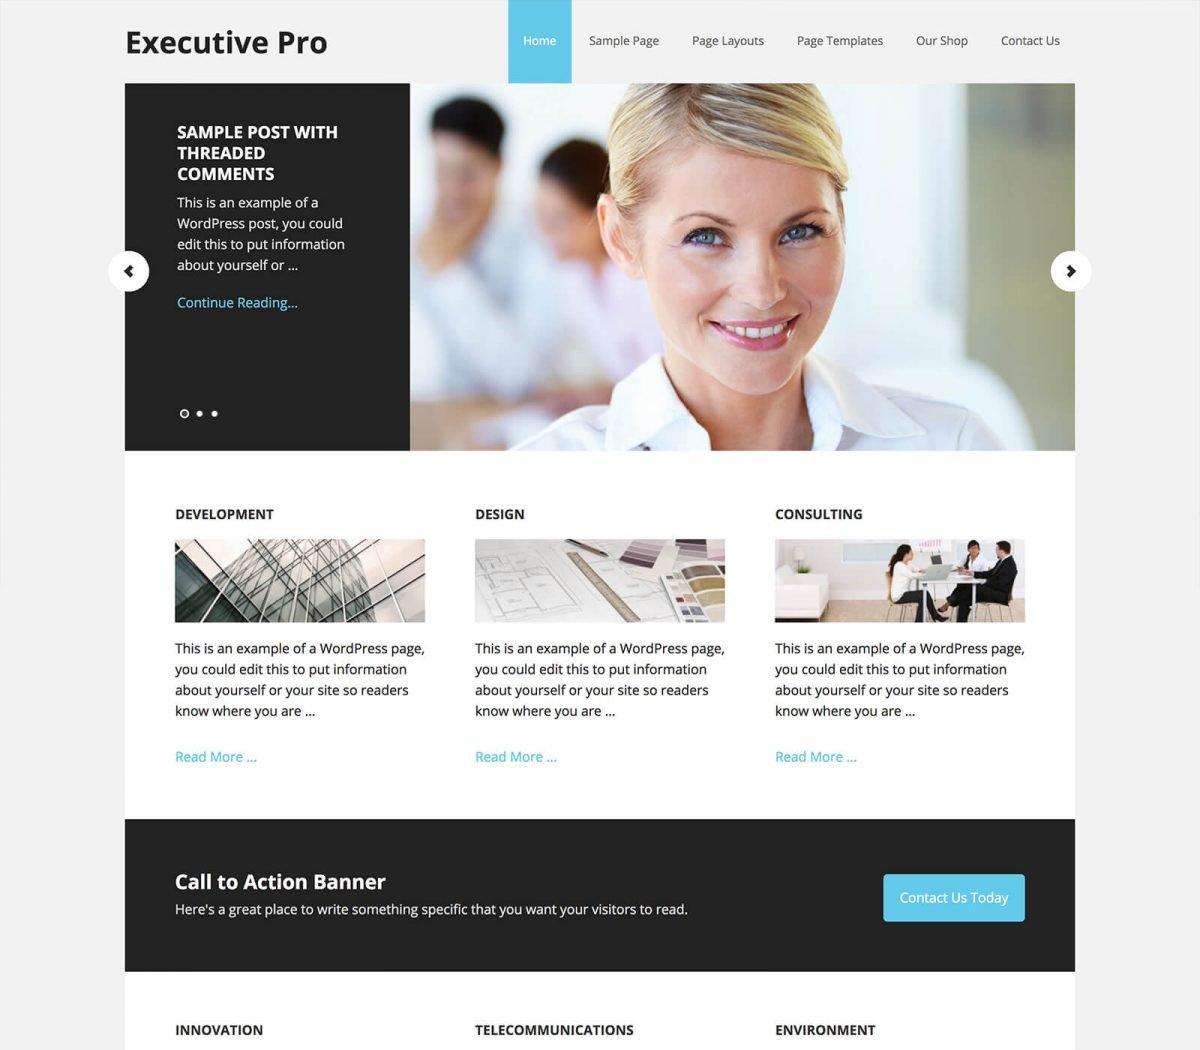 Executive Theme Pro